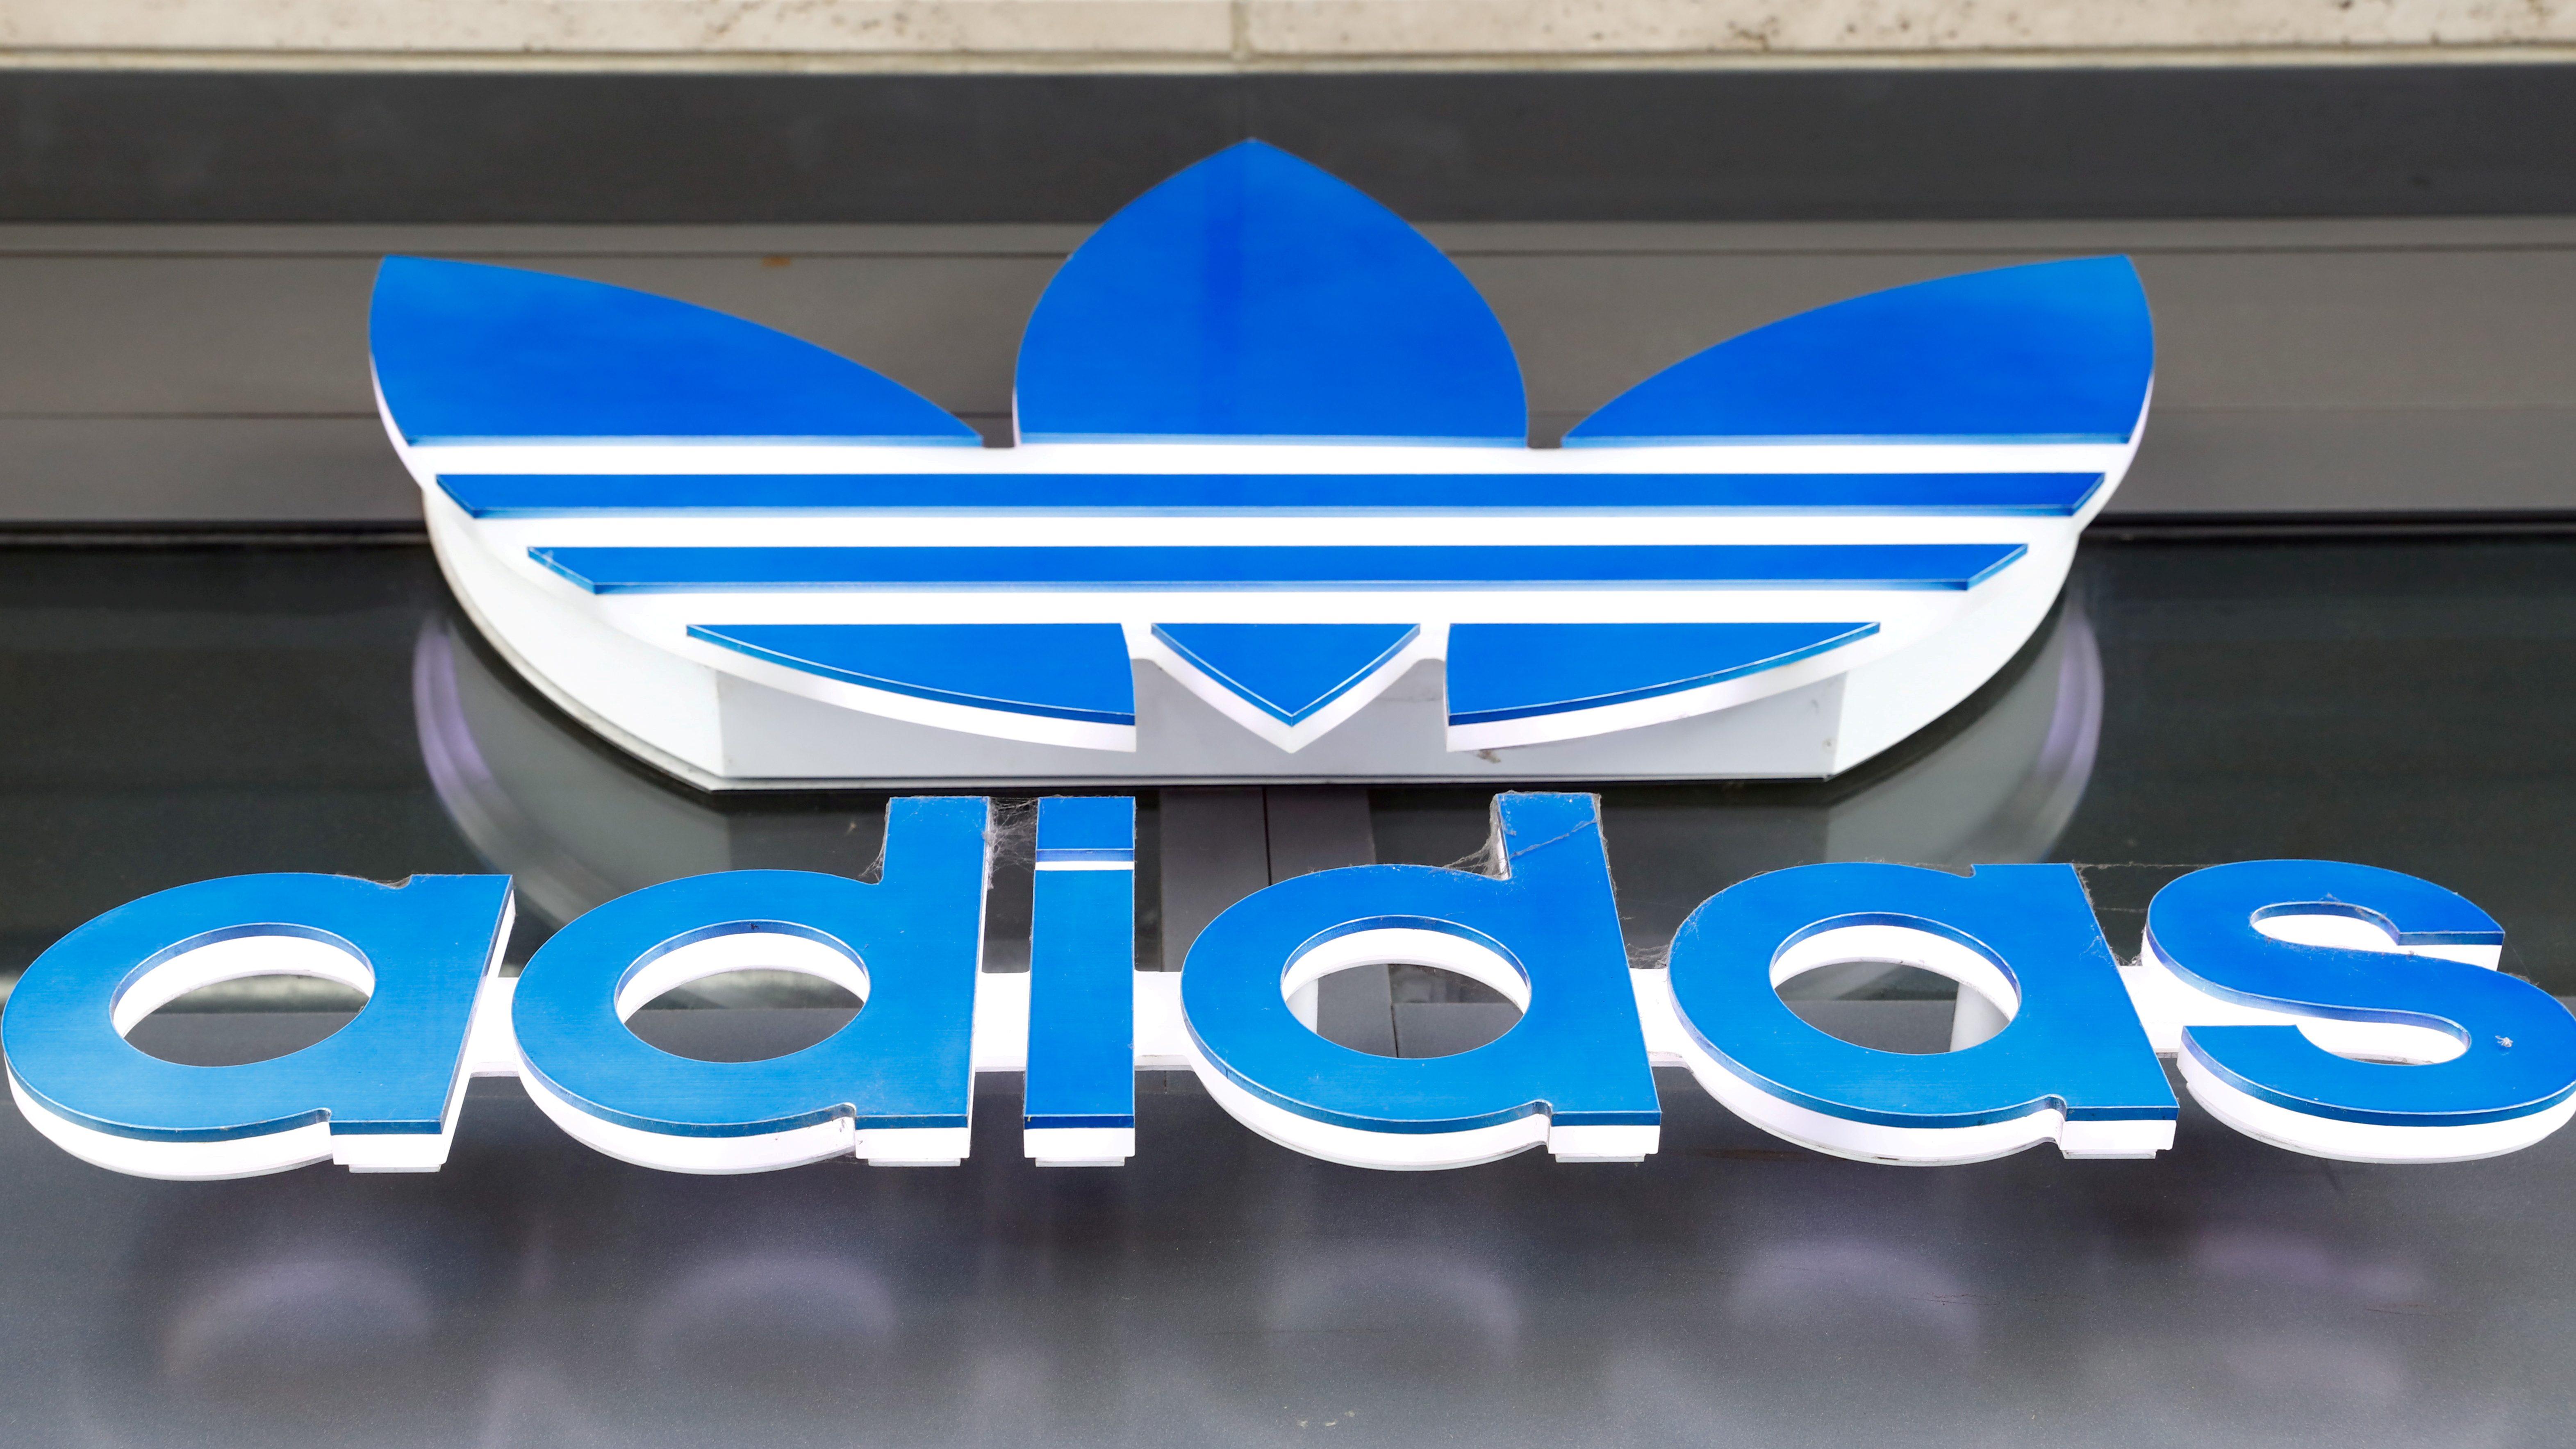 A photograph of an adidas store sign logo